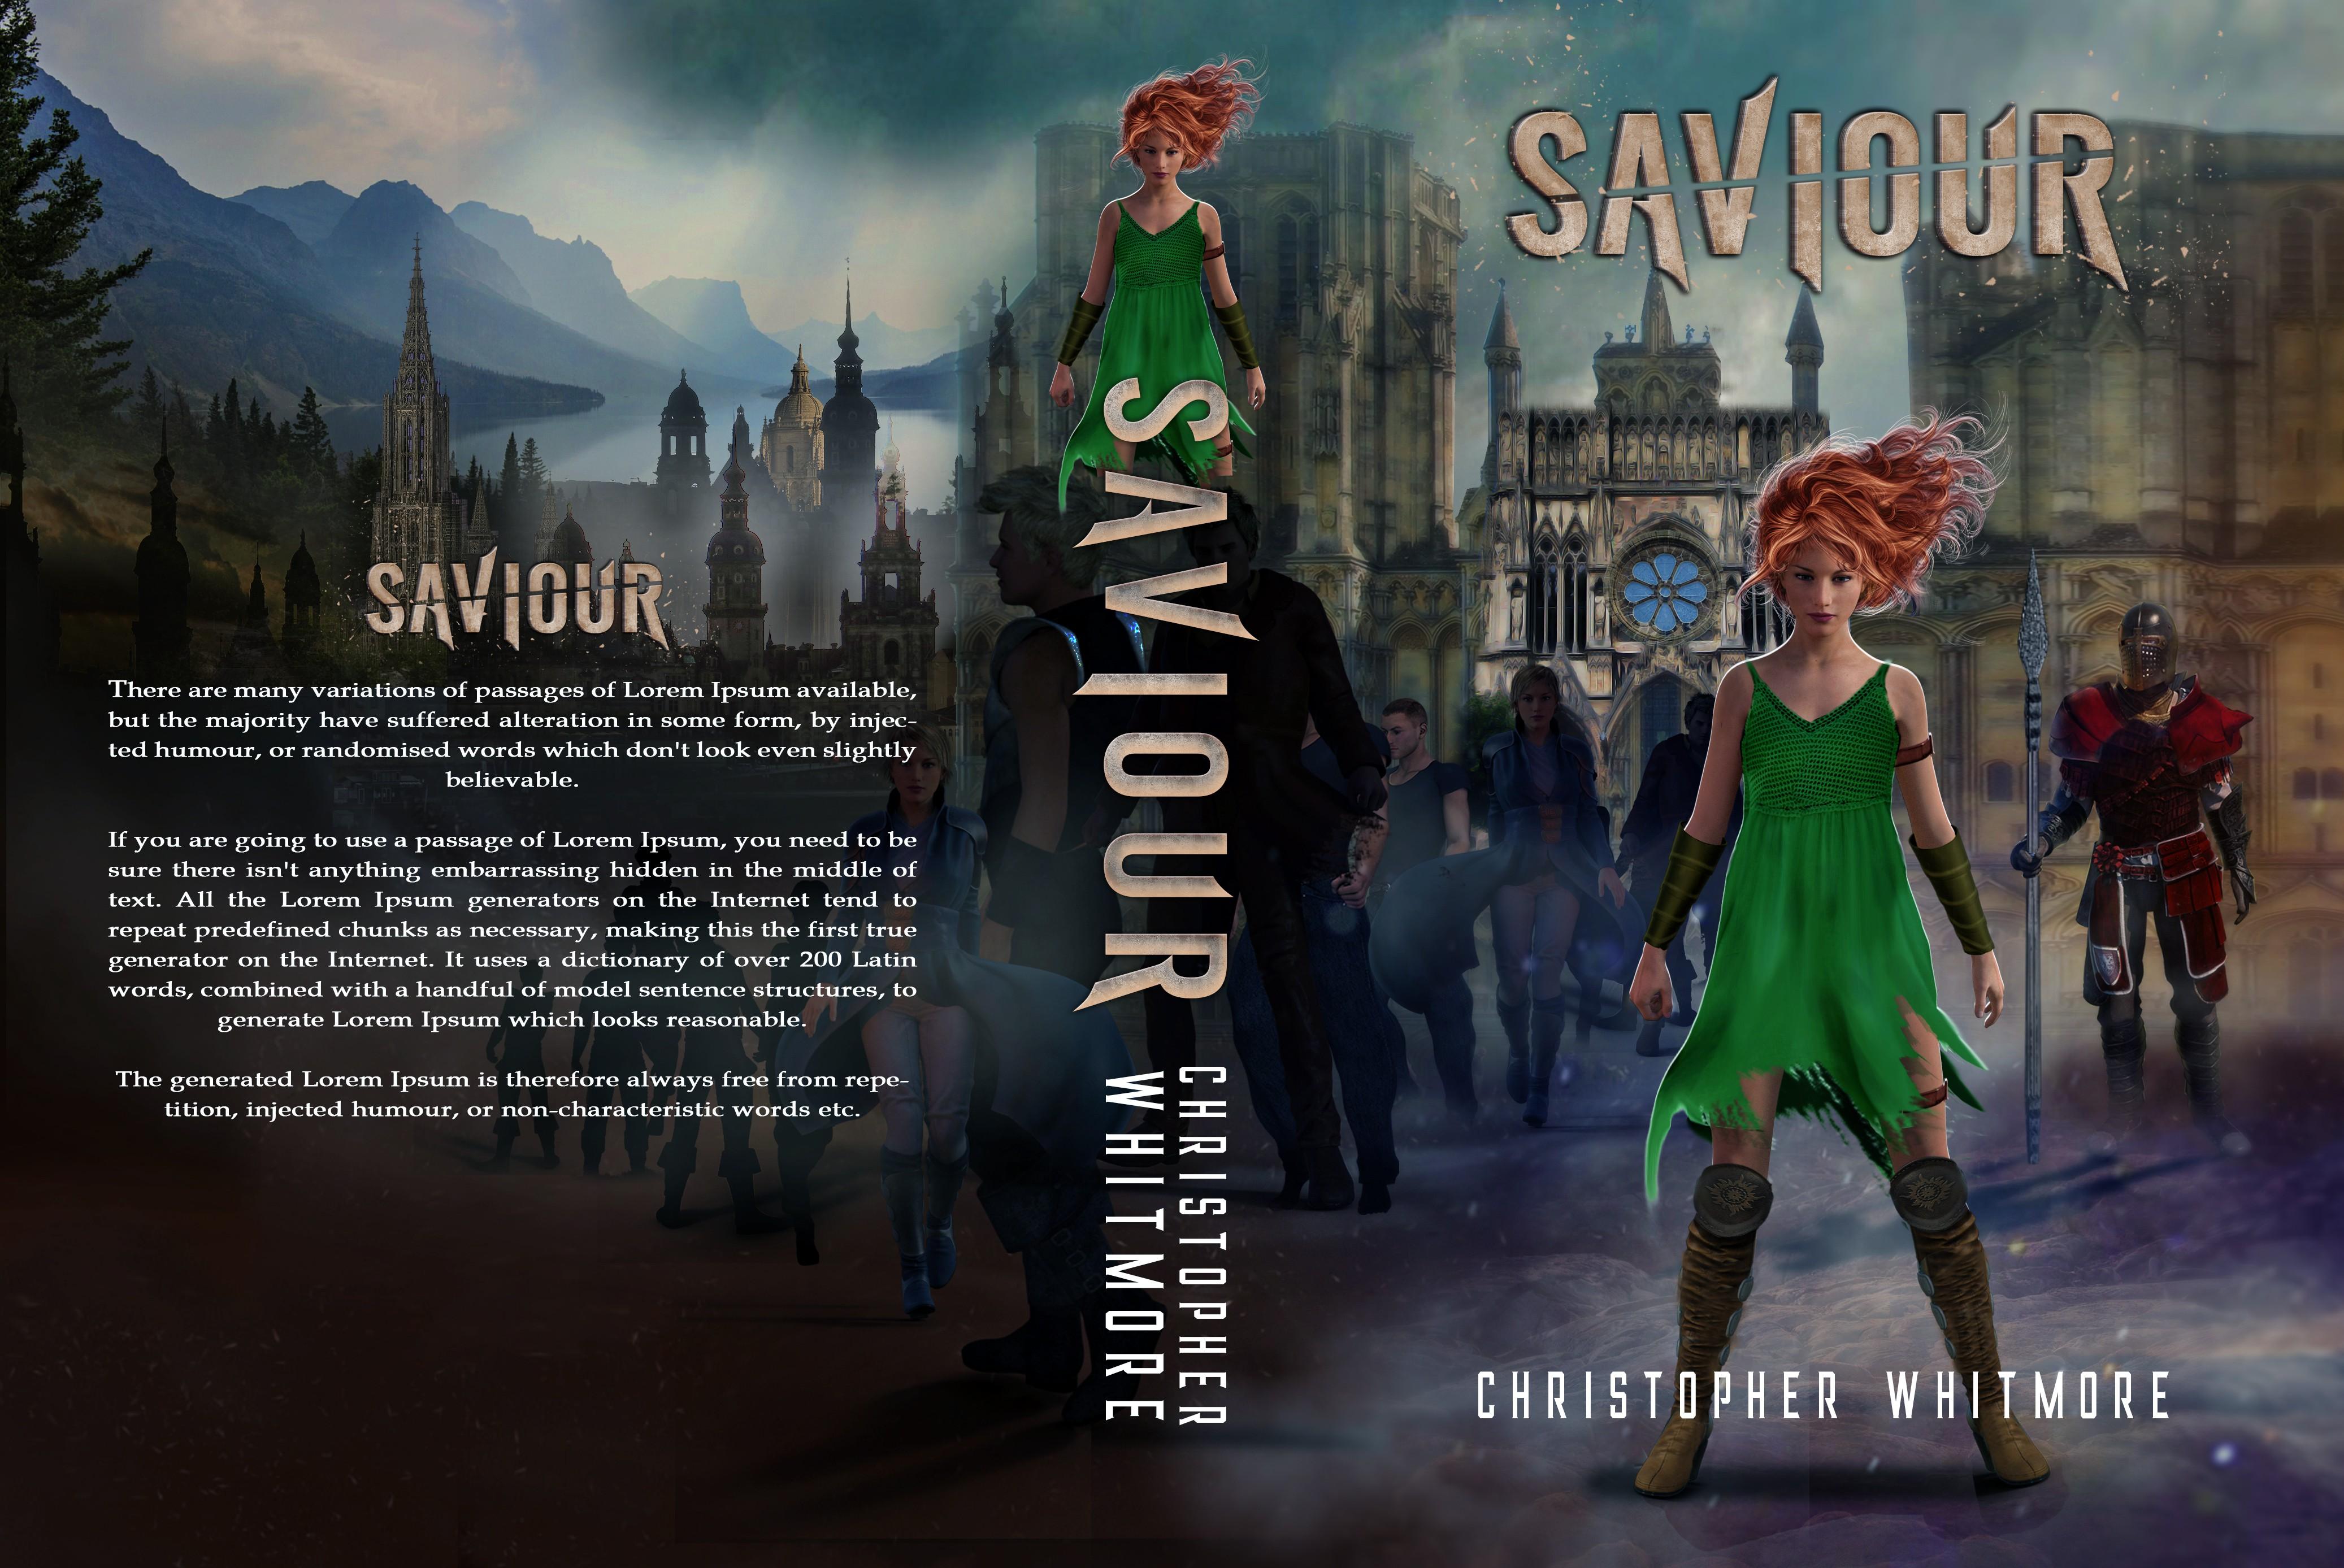 Create a cover for a new fantasy novel